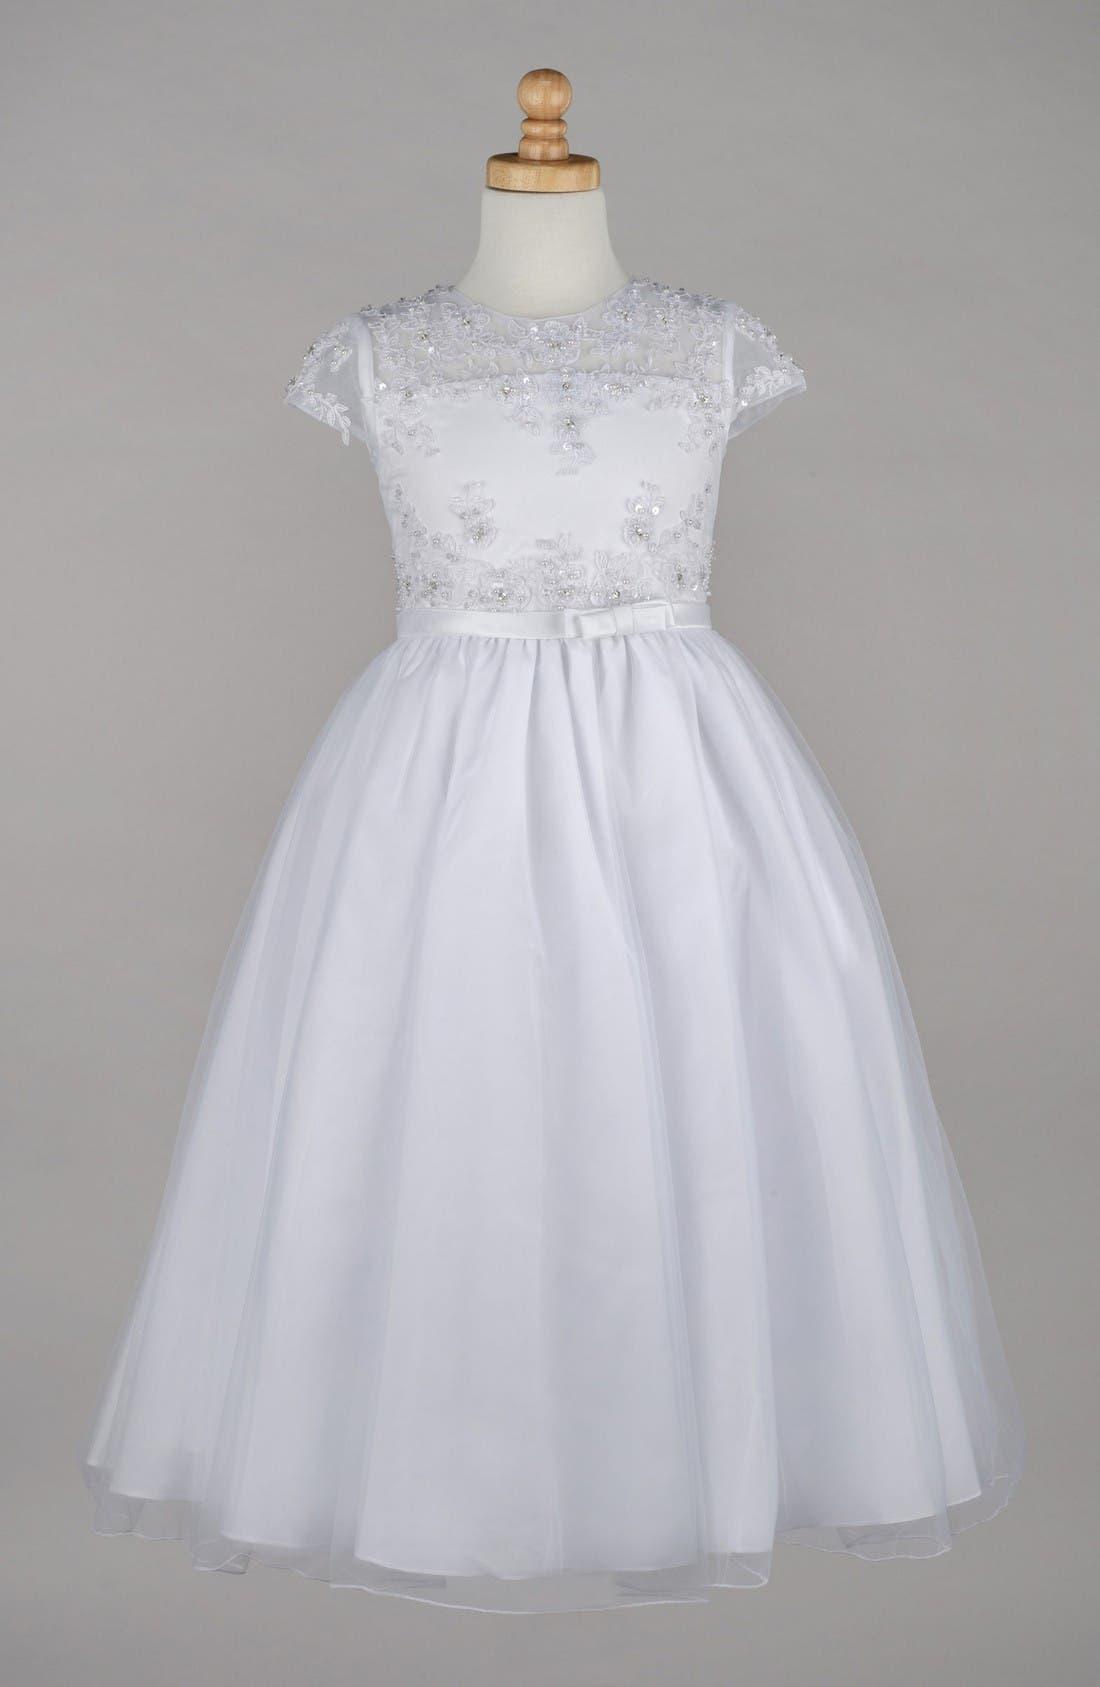 Alternate Image 1 Selected - Lauren Marie Beaded Lace Bodice First Communion Dress (Little Girls & Big Girls)